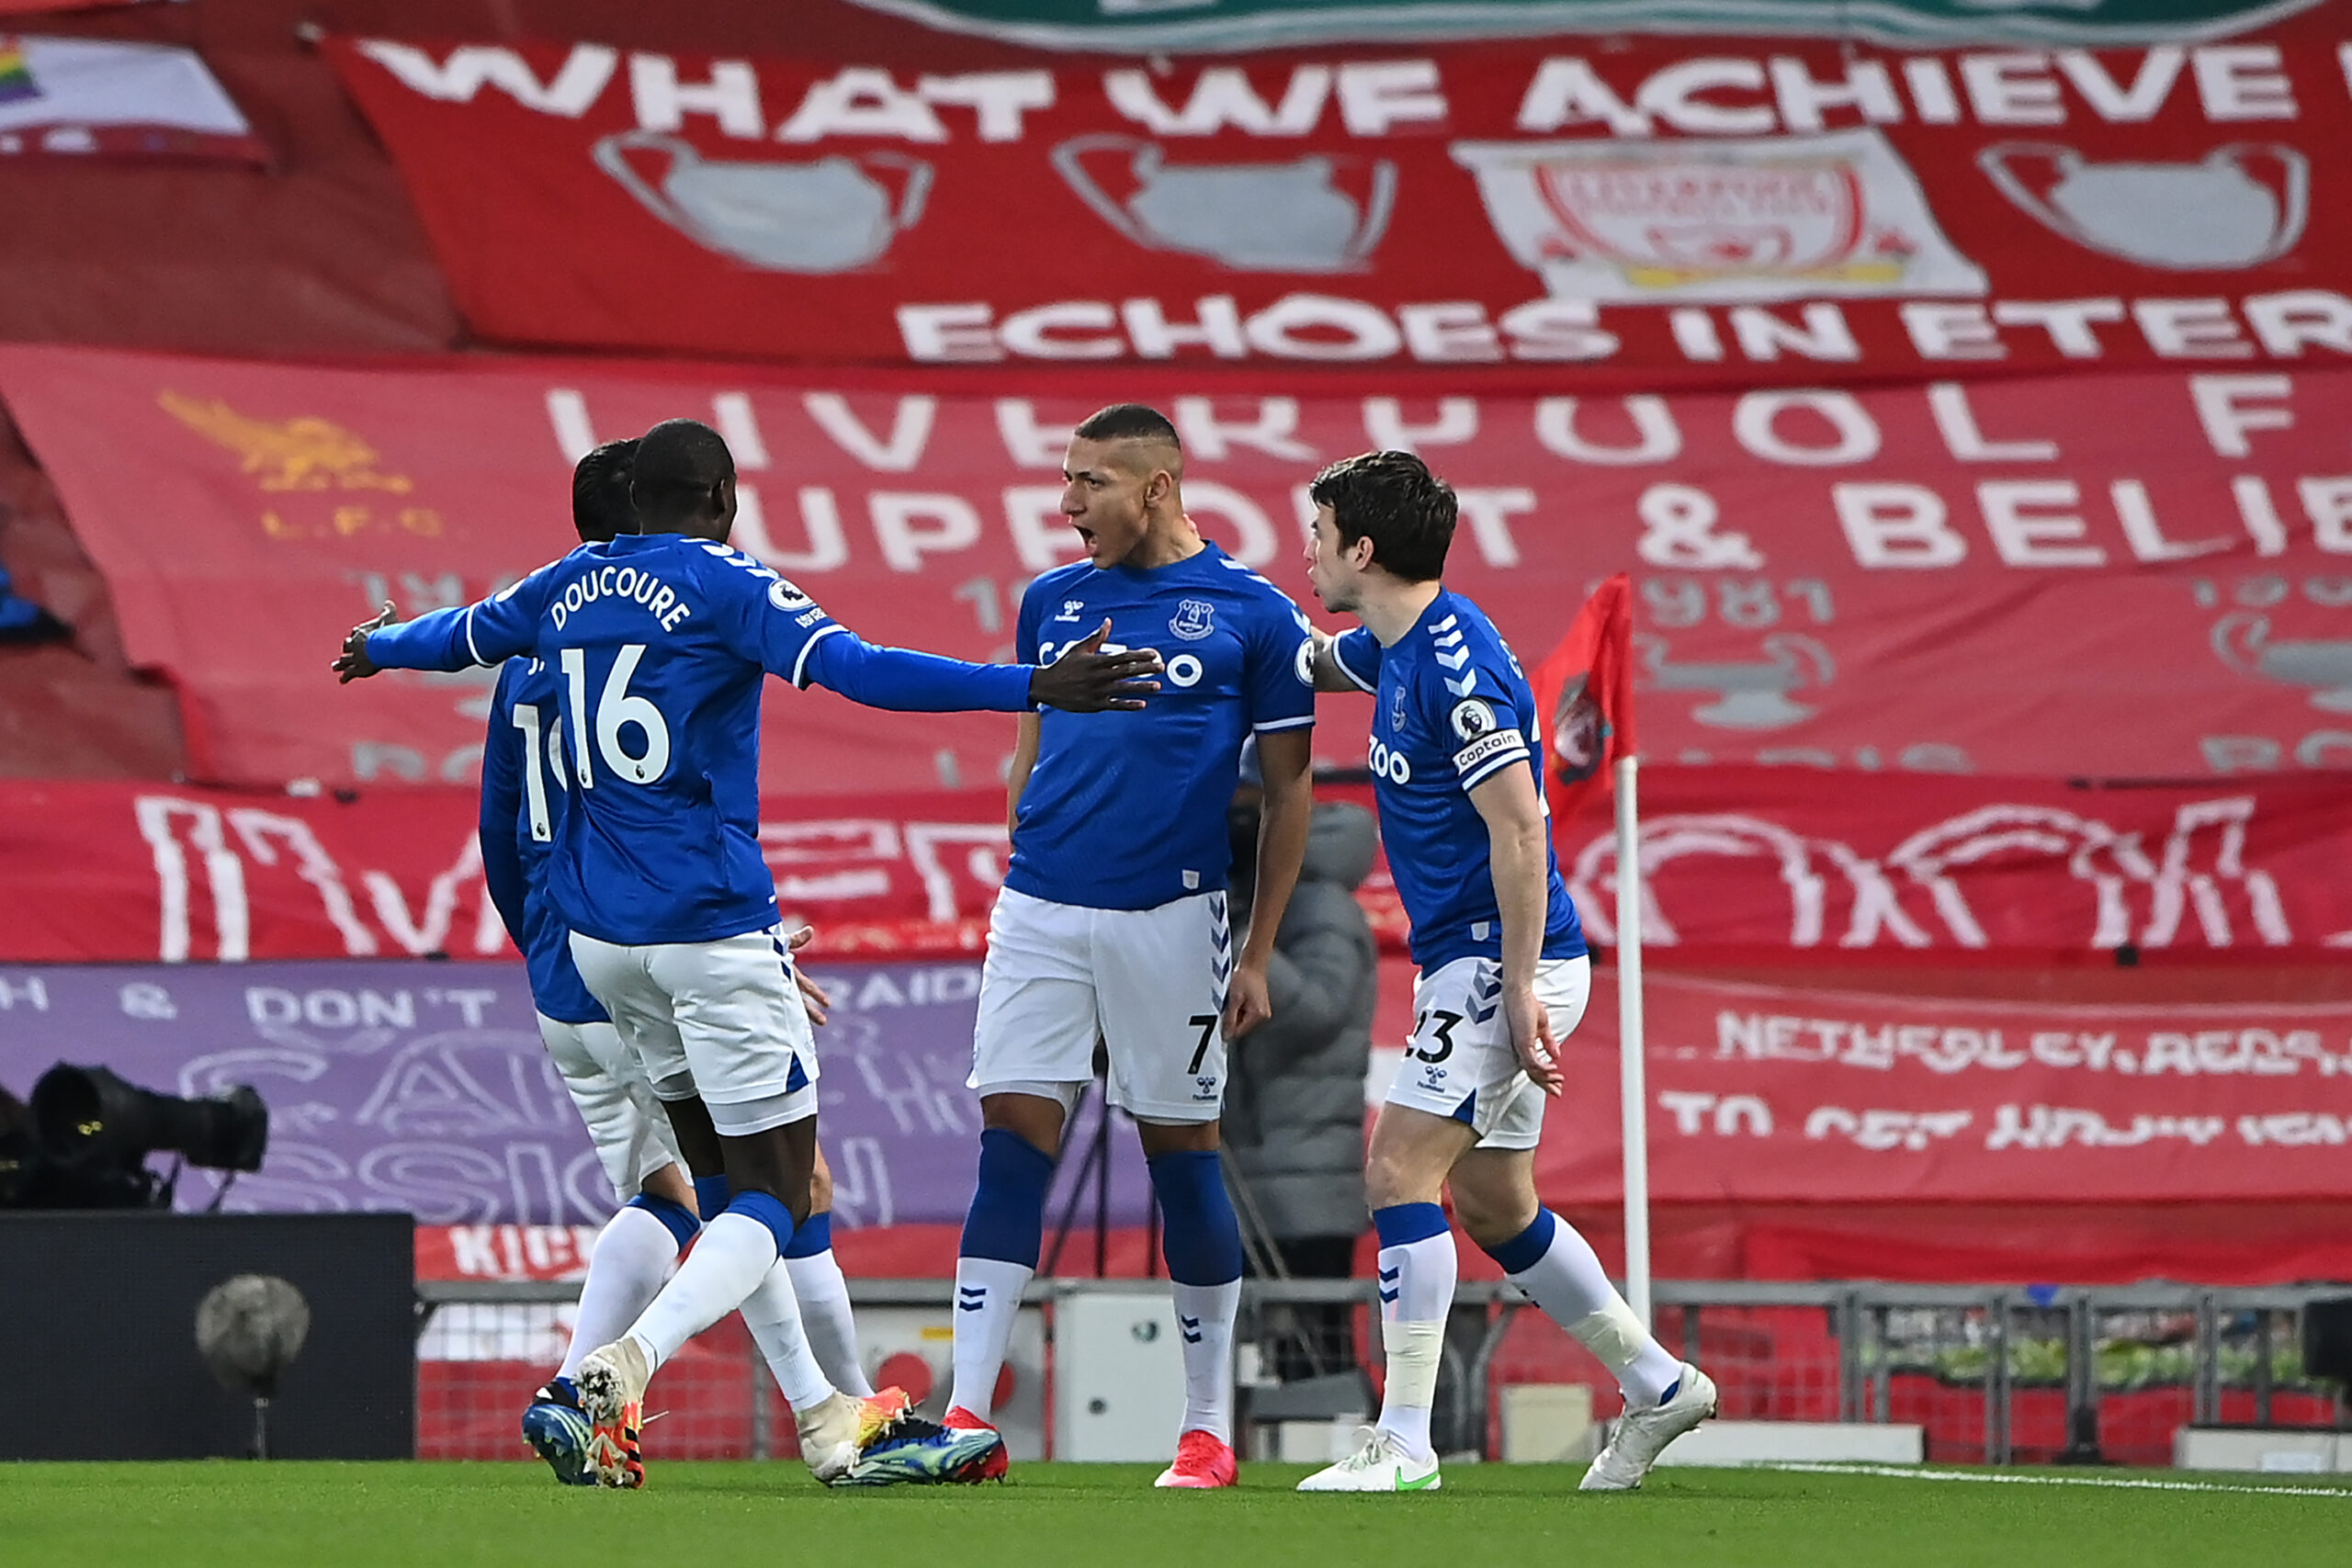 Everton Richarlison